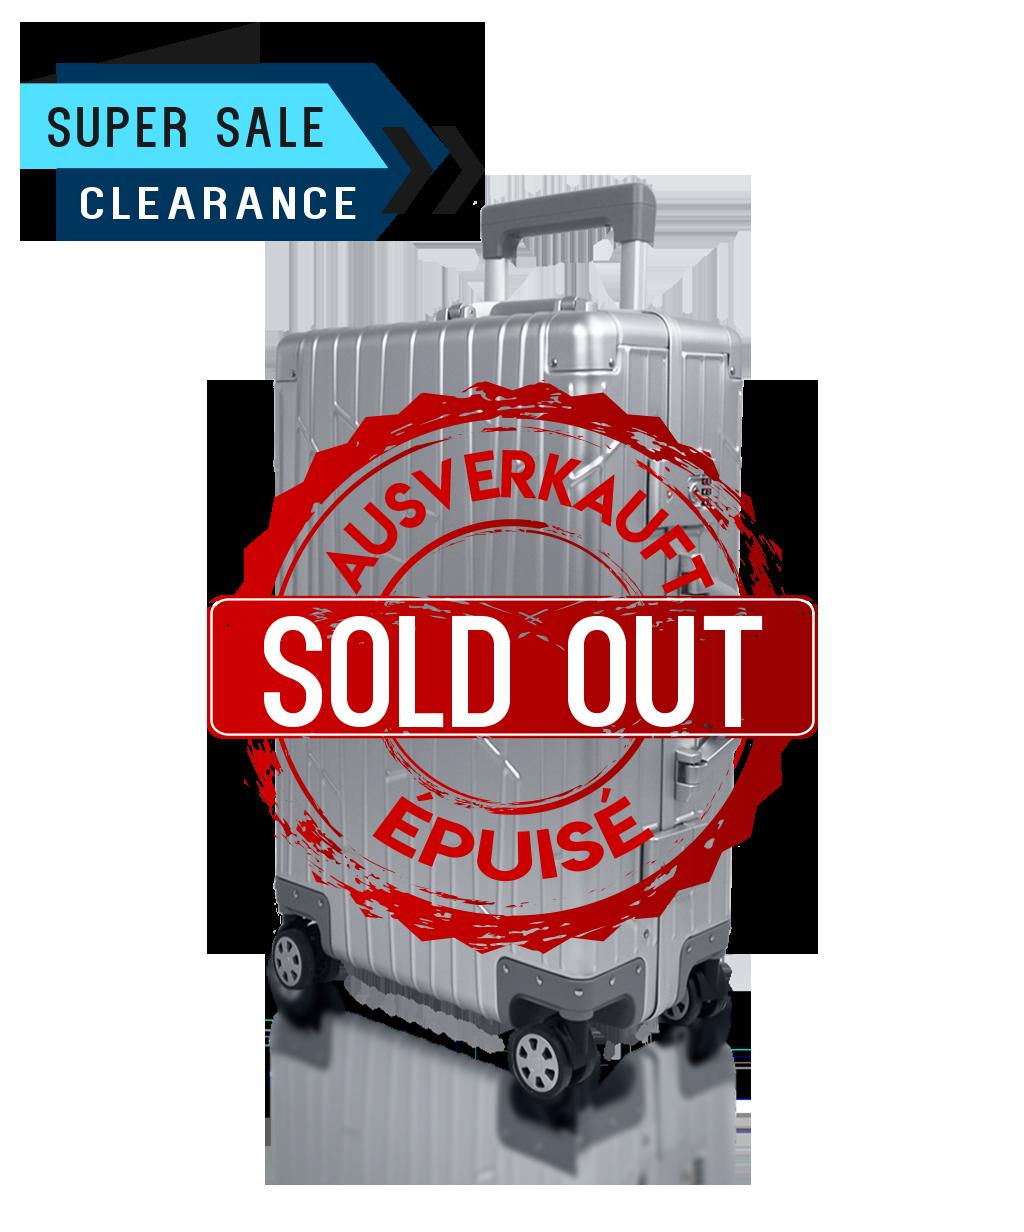 Check-in KOM-001E silber aluminium suitcase gundel checked luggage tsa-locks soldout bware sale